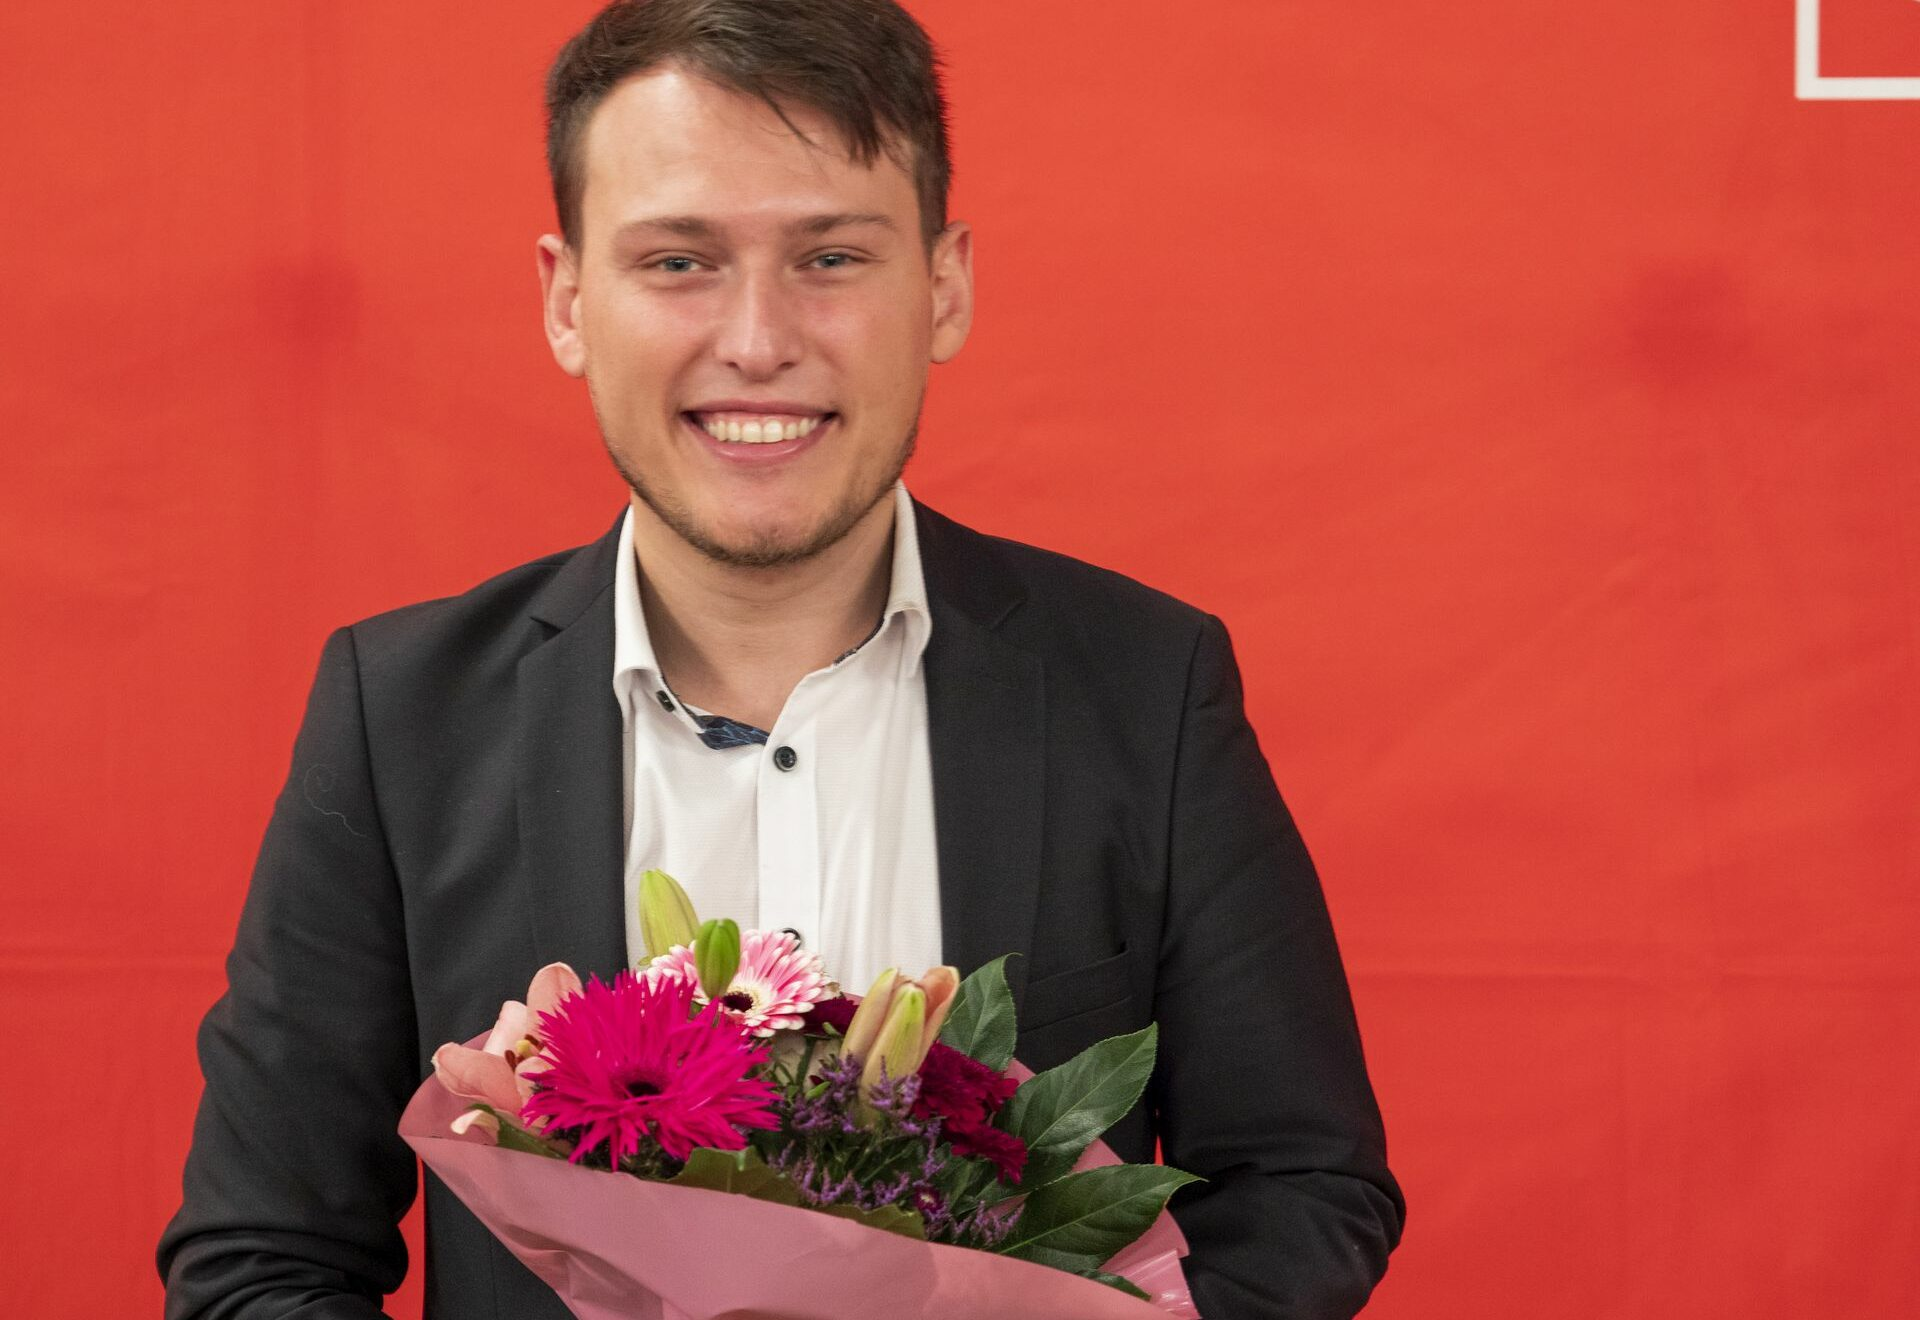 Tarek Saad, Kandidat der SPD im Landtagswahlkreis Segeberg-Ost